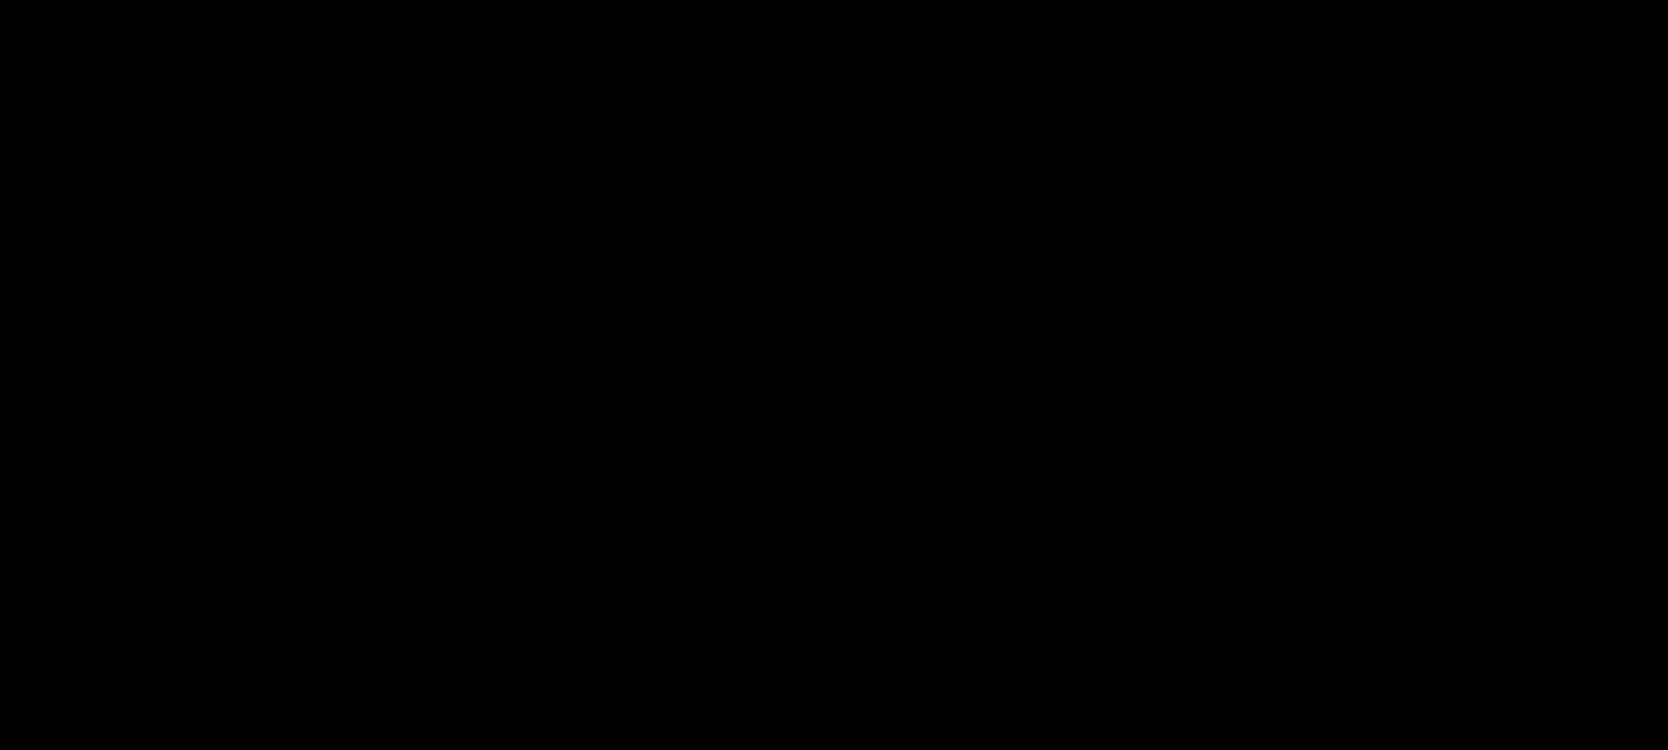 My Darlin' logo